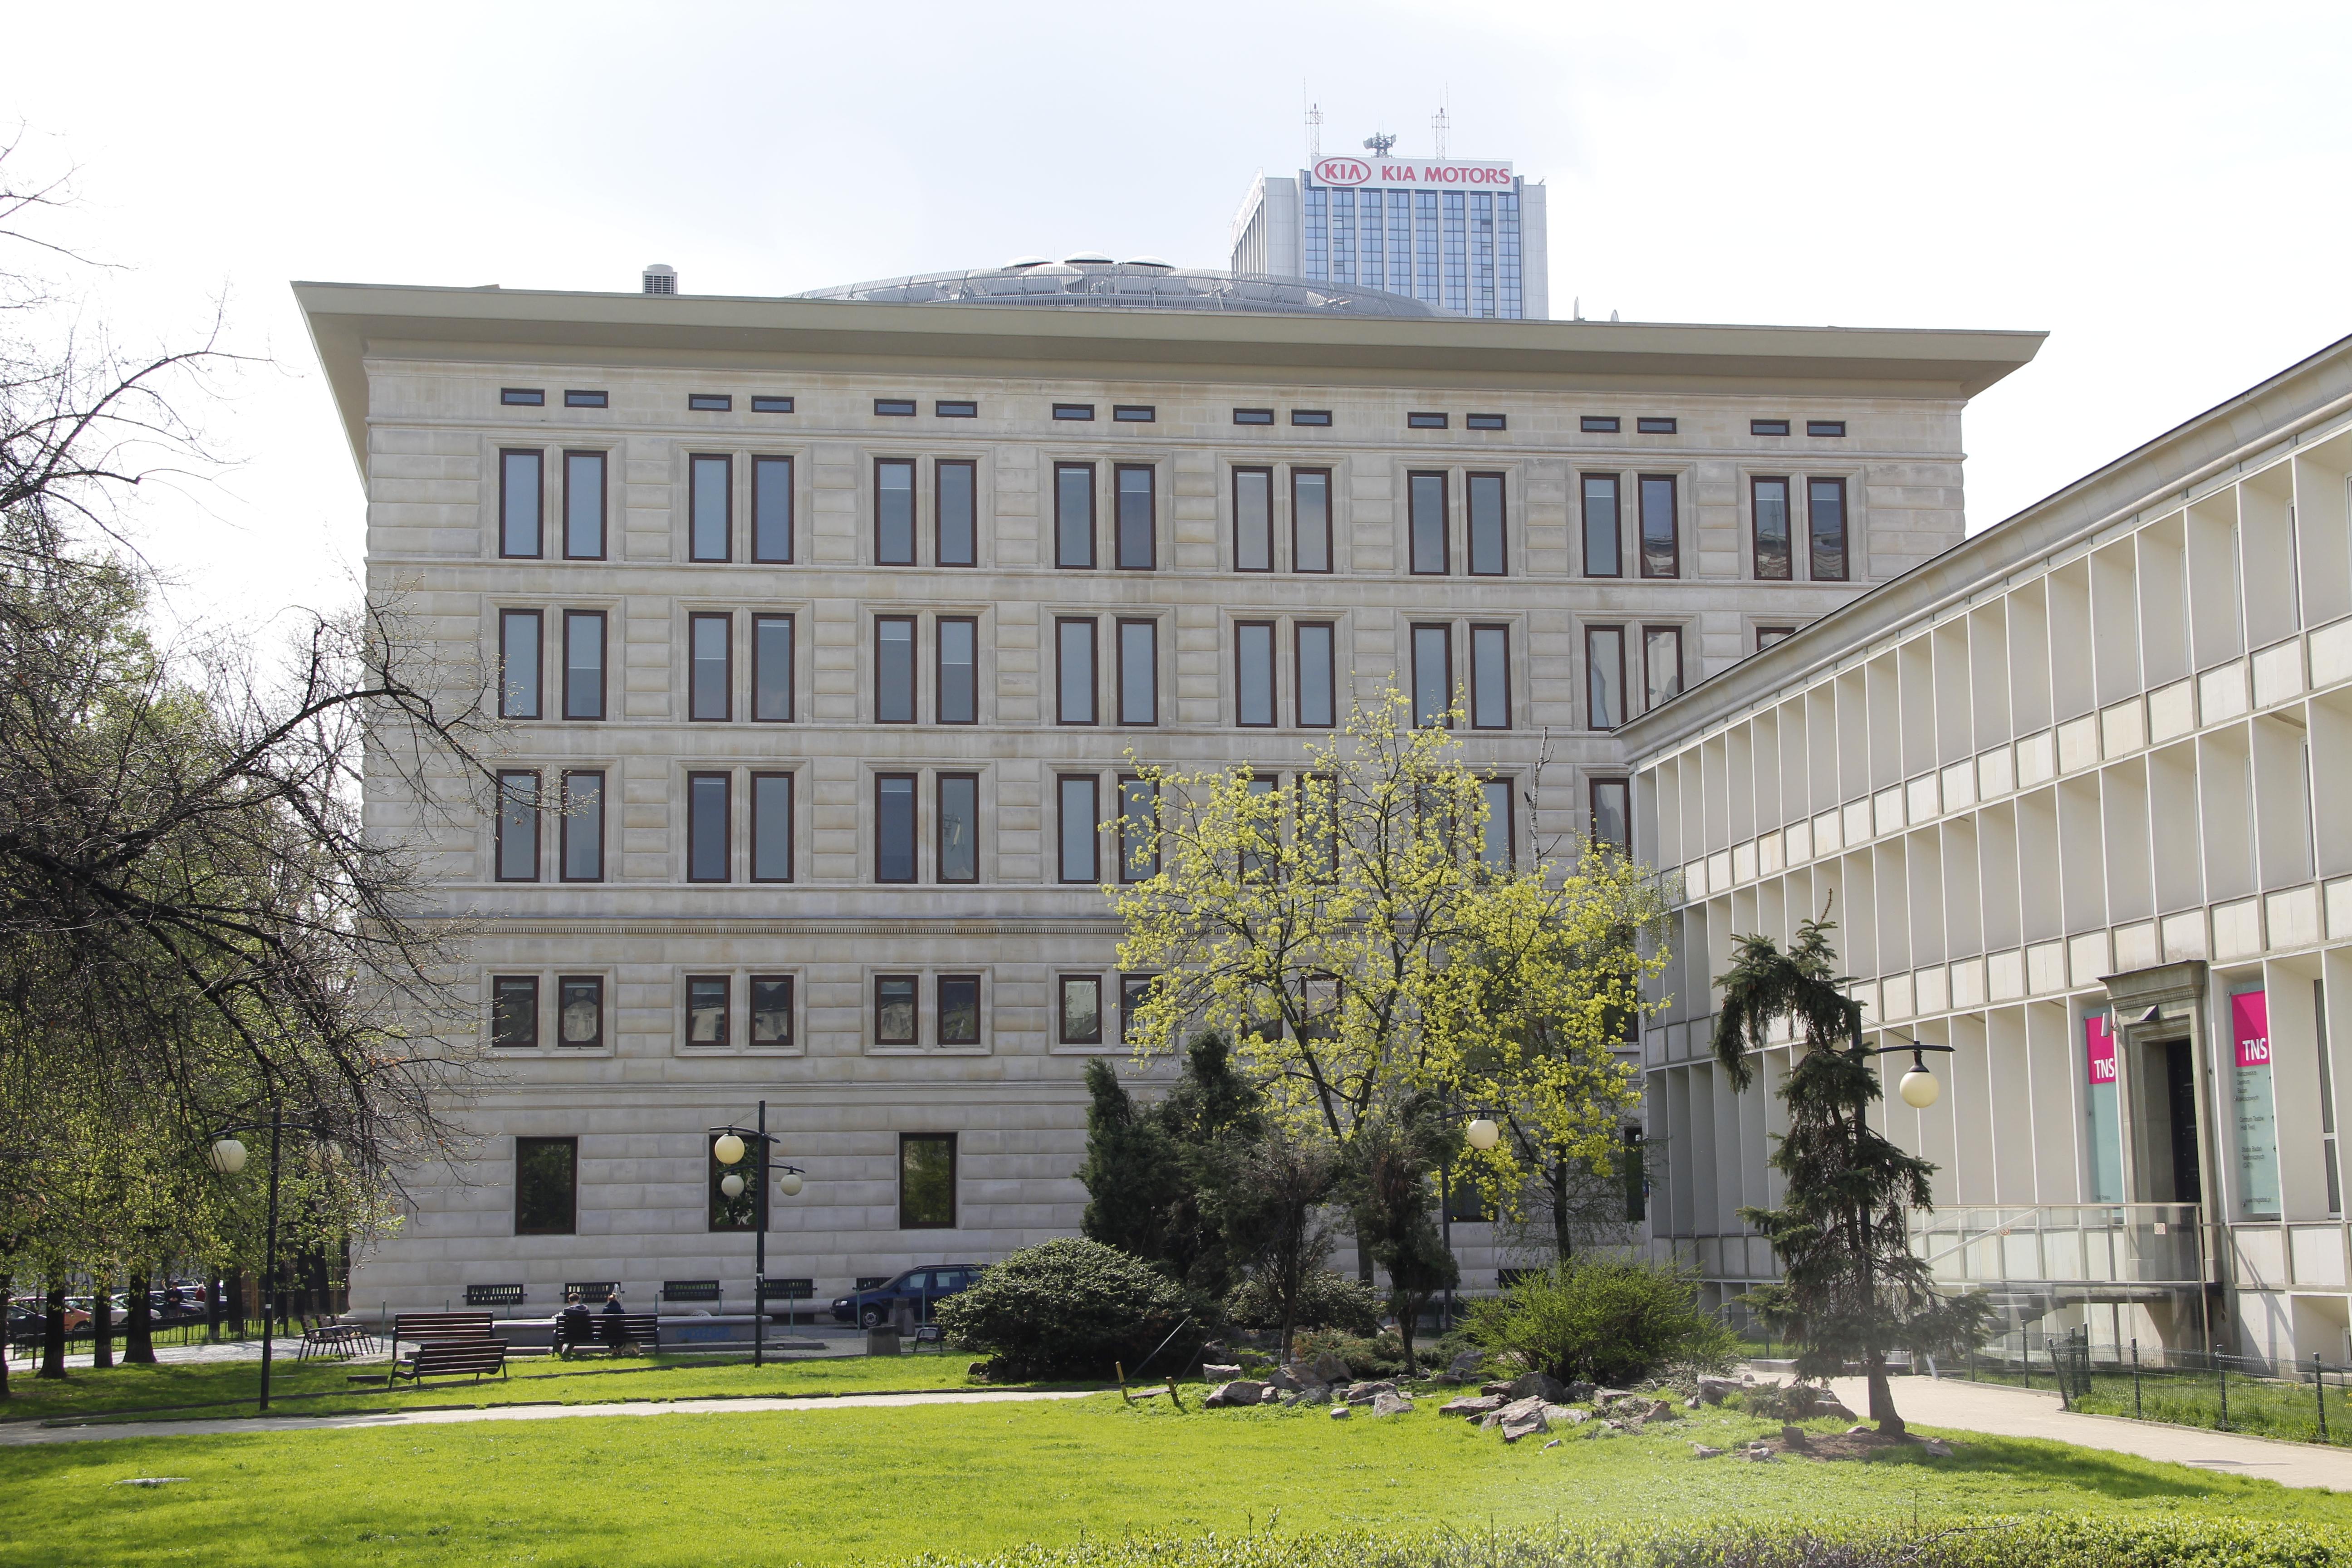 Ufficio Primo : File:biurowiec prezydium rządu ufficio primo warsaw mg 2934.jpg